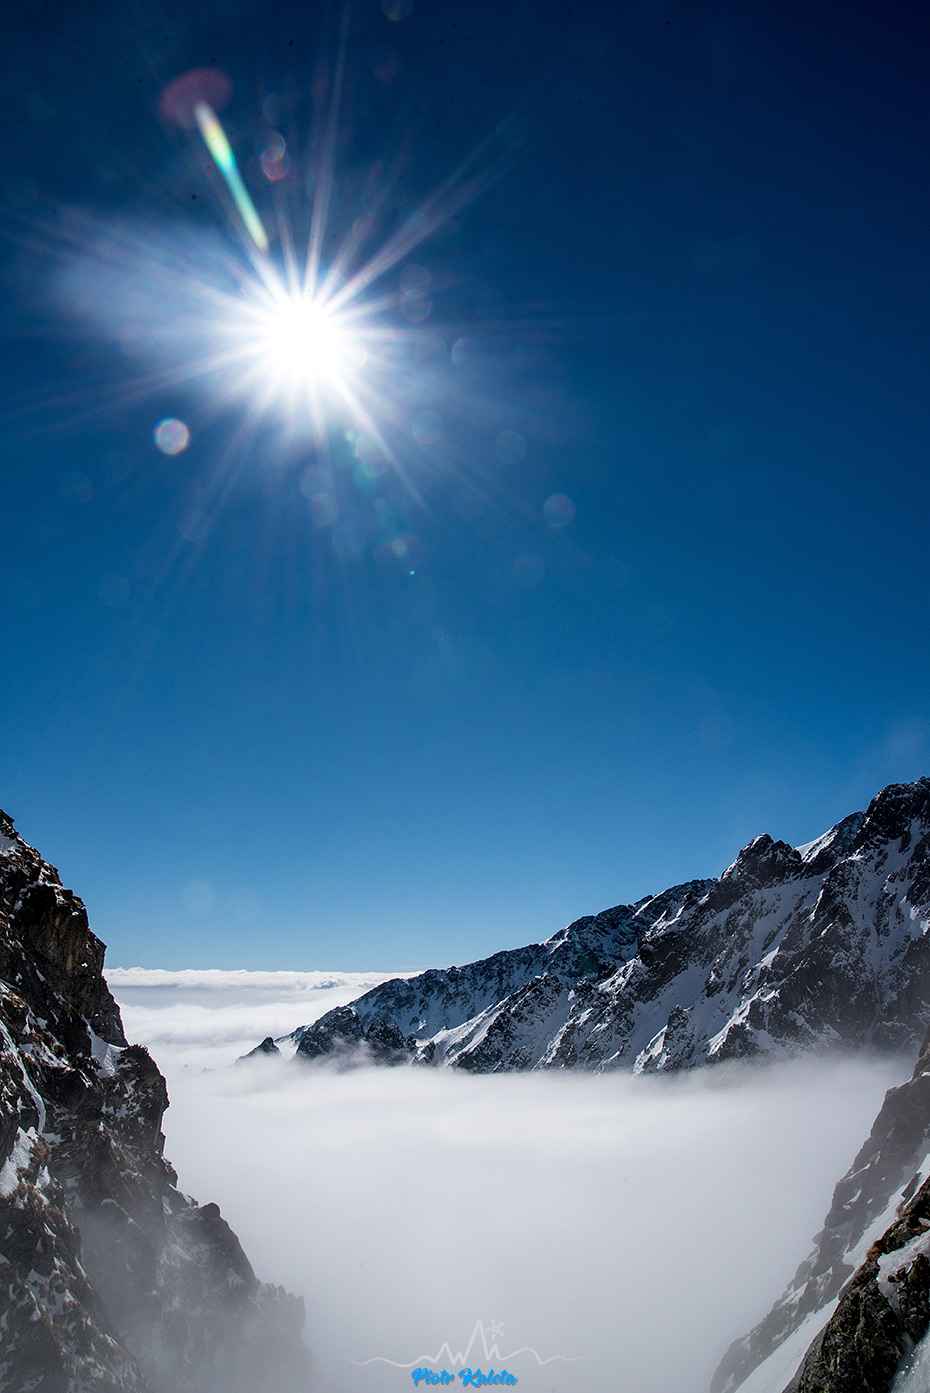 Lodospad Łomnicki, Lomnický ľad